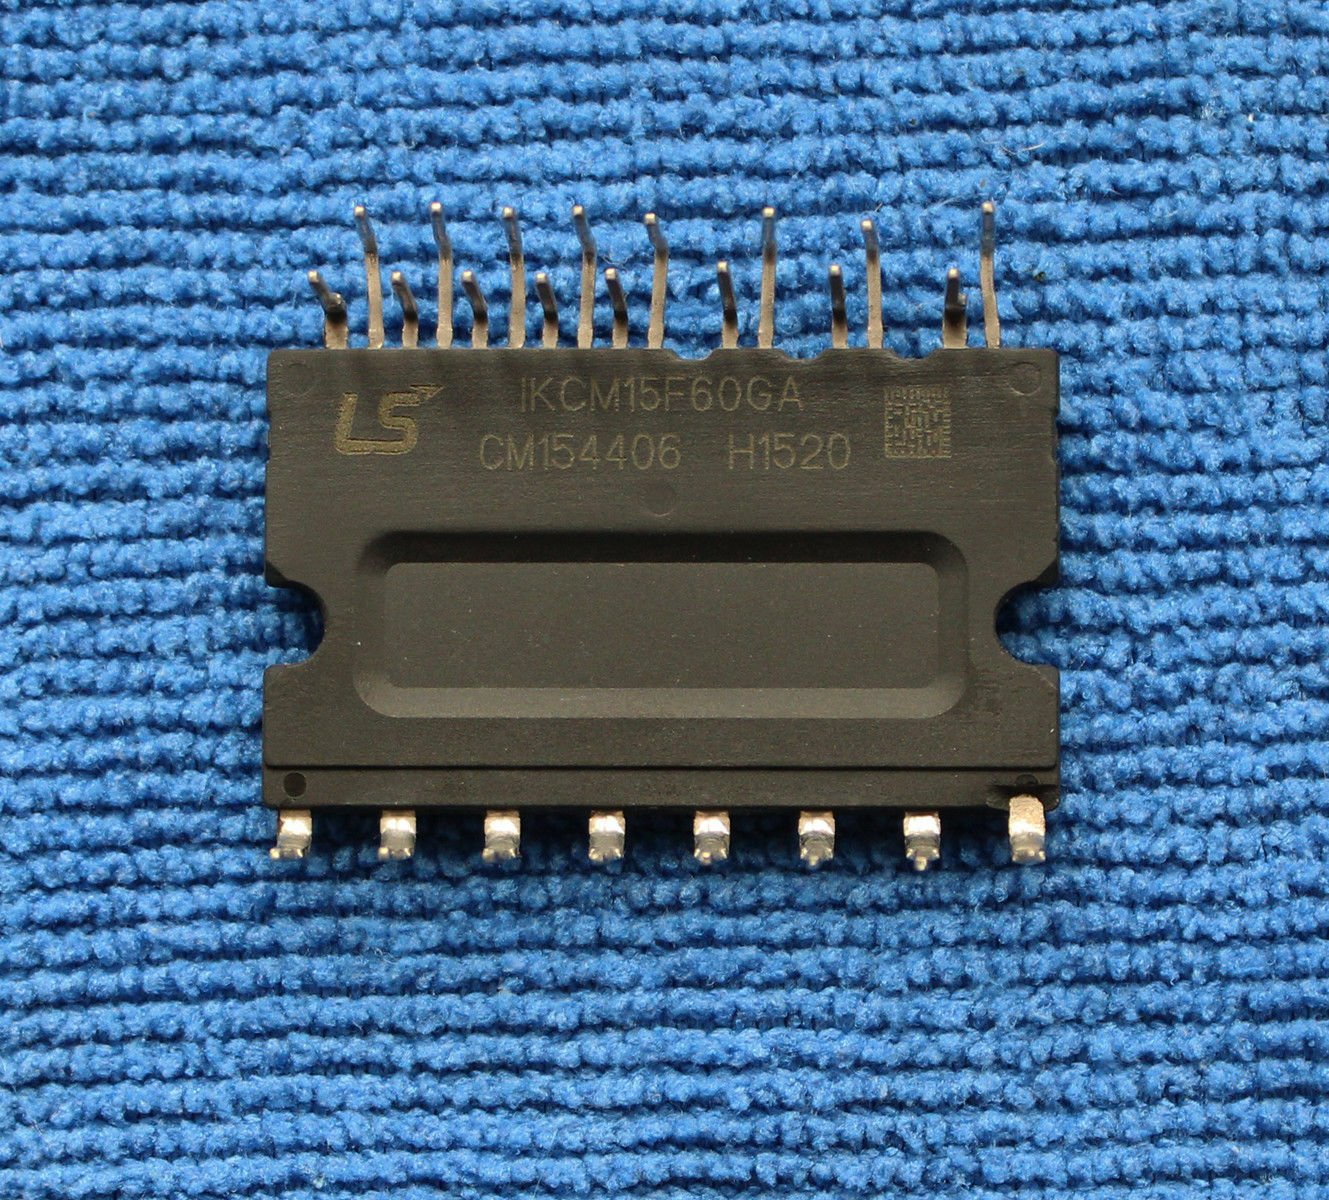 IKCM15F60GA LS POWER MODULE  /'/'UK COMPANY SINCE1983 NIKKO/'/'